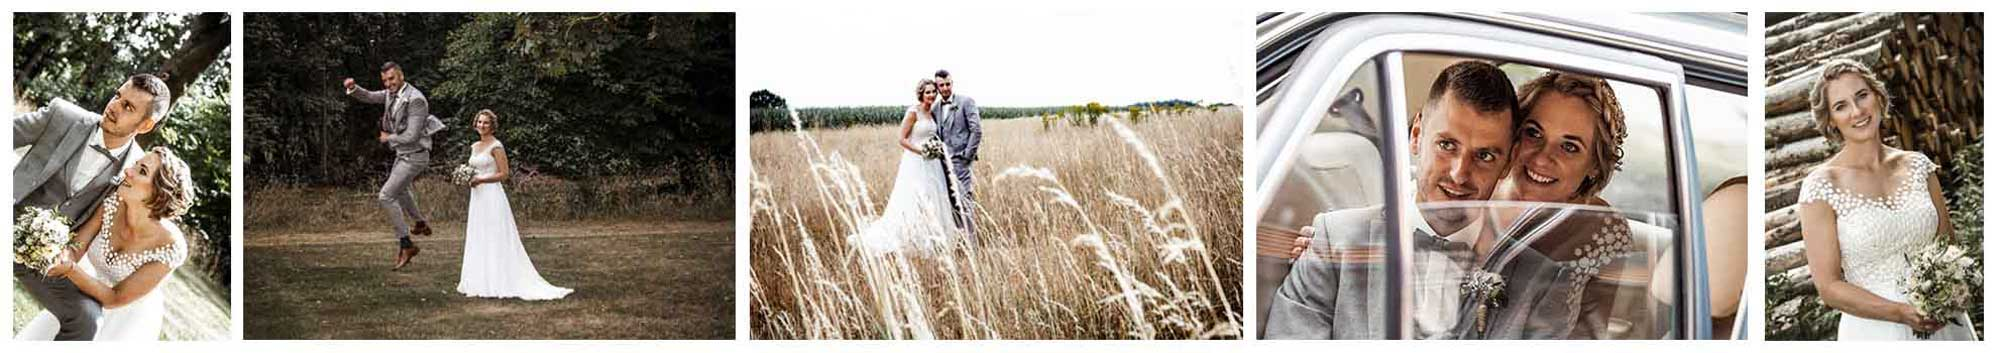 hochzeitsfotograf hannover preise Preisliste Fotograf Hochzeit hochzeitsreportage preise hochzeitsfotograf preise erfahrungen preisliste